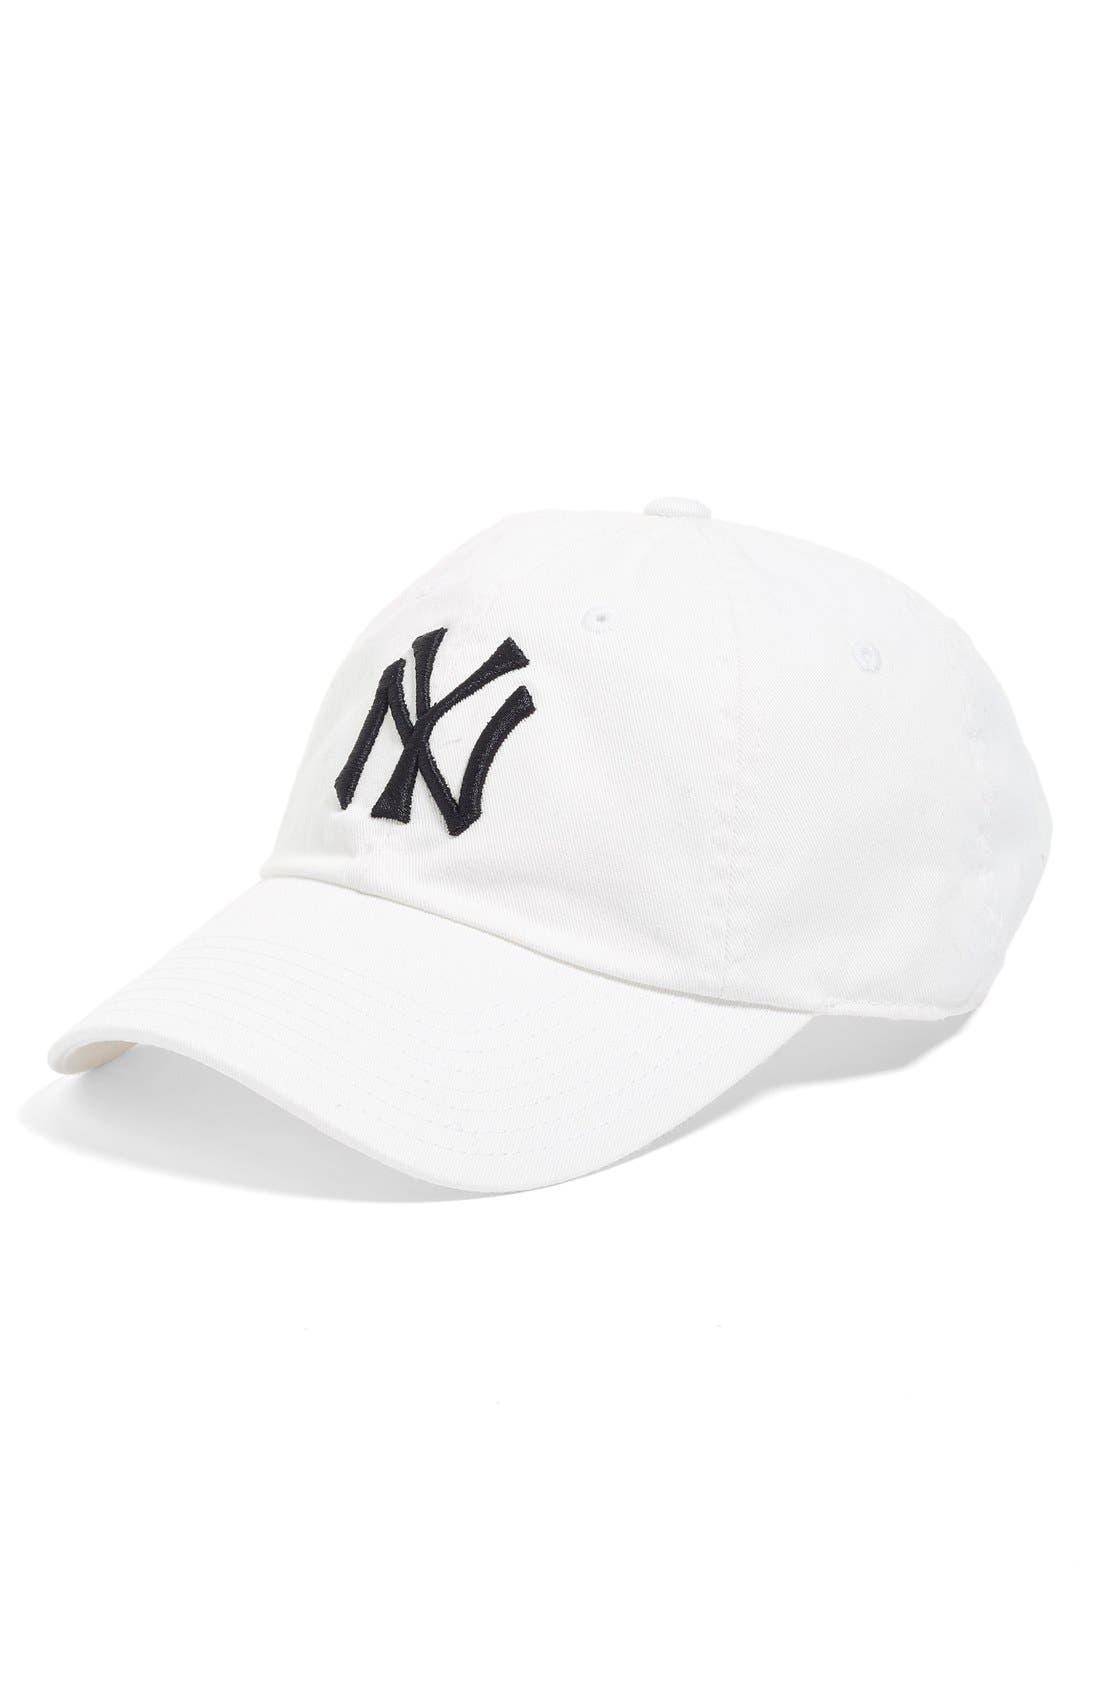 Main Image - American Needle 'New York Yankees' Baseball Cap